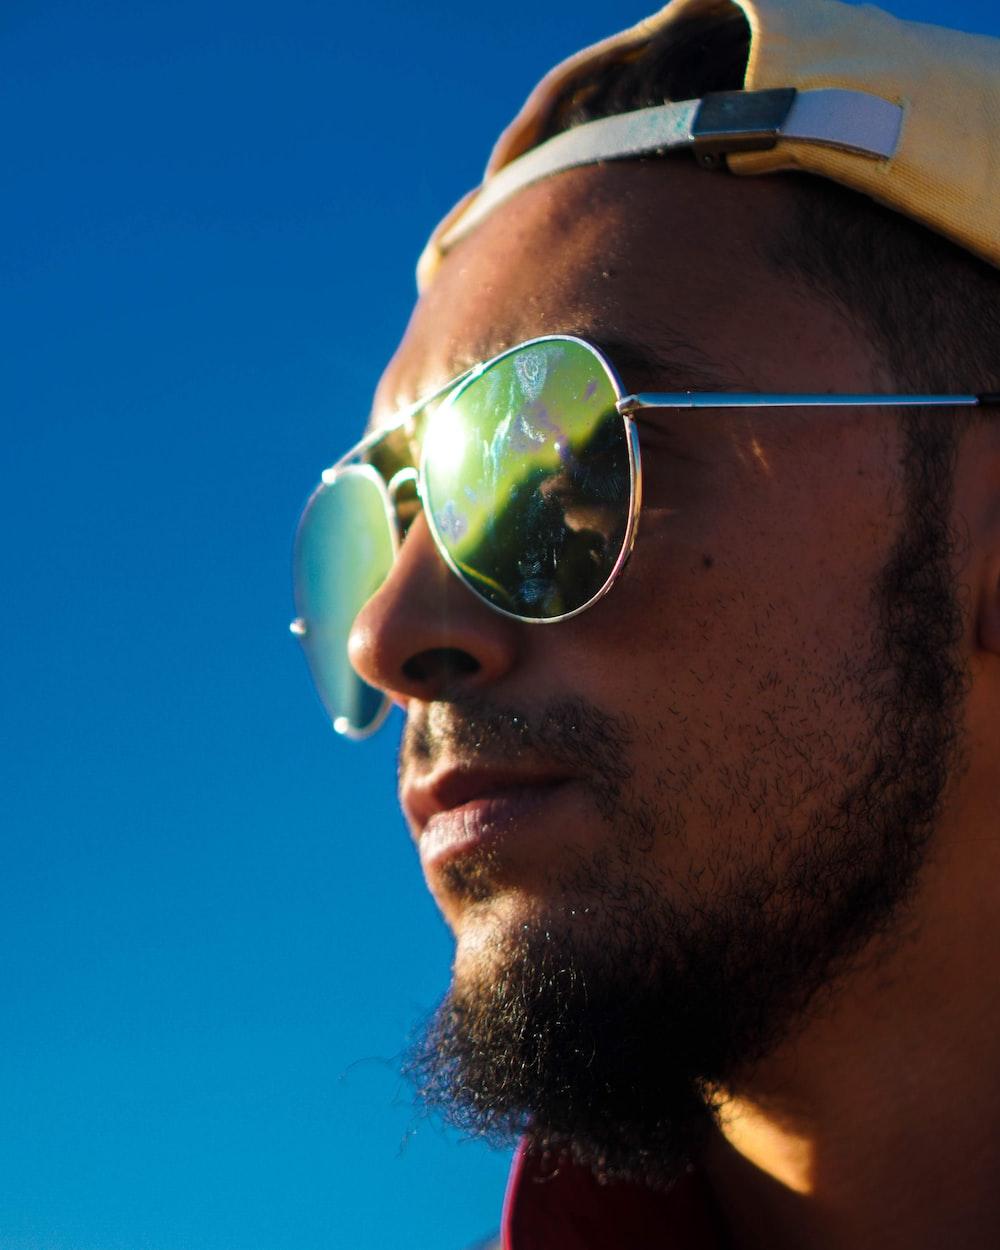 man wearing sunglasses facing sideways